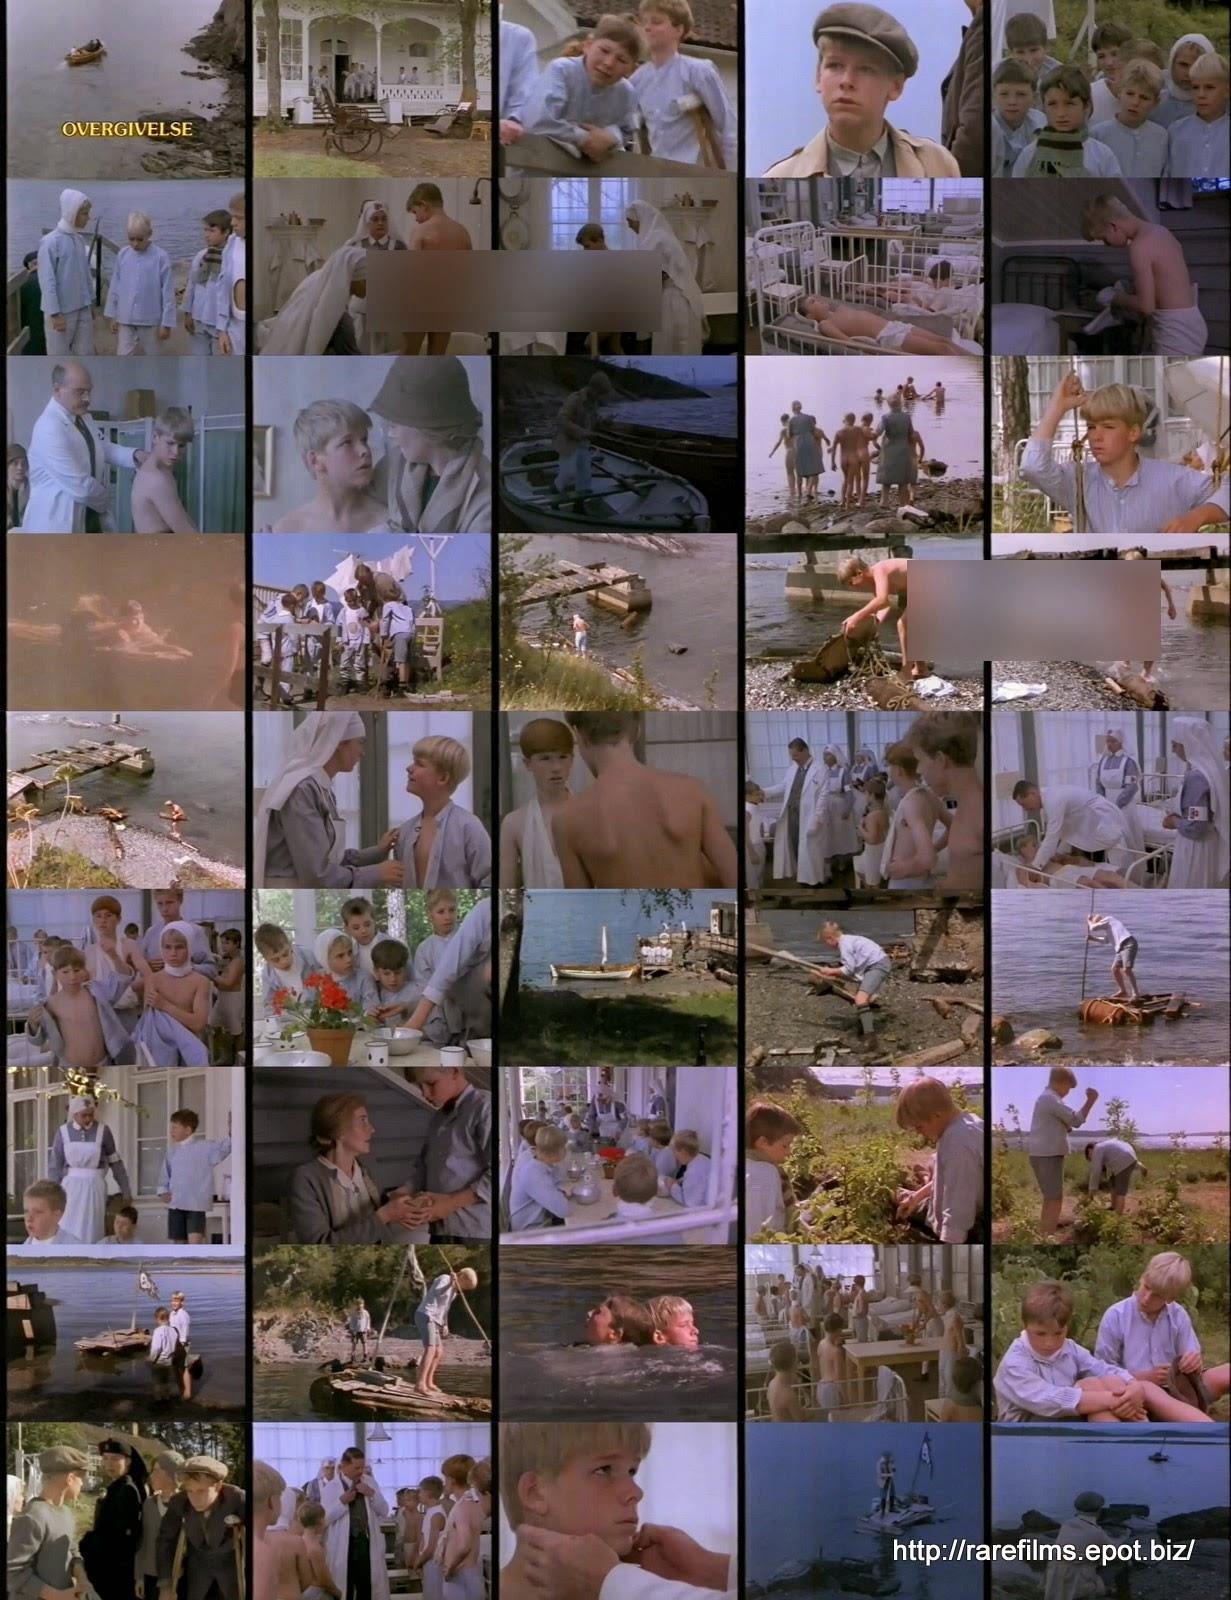 Капитуляция / Overgivelse. 1988.